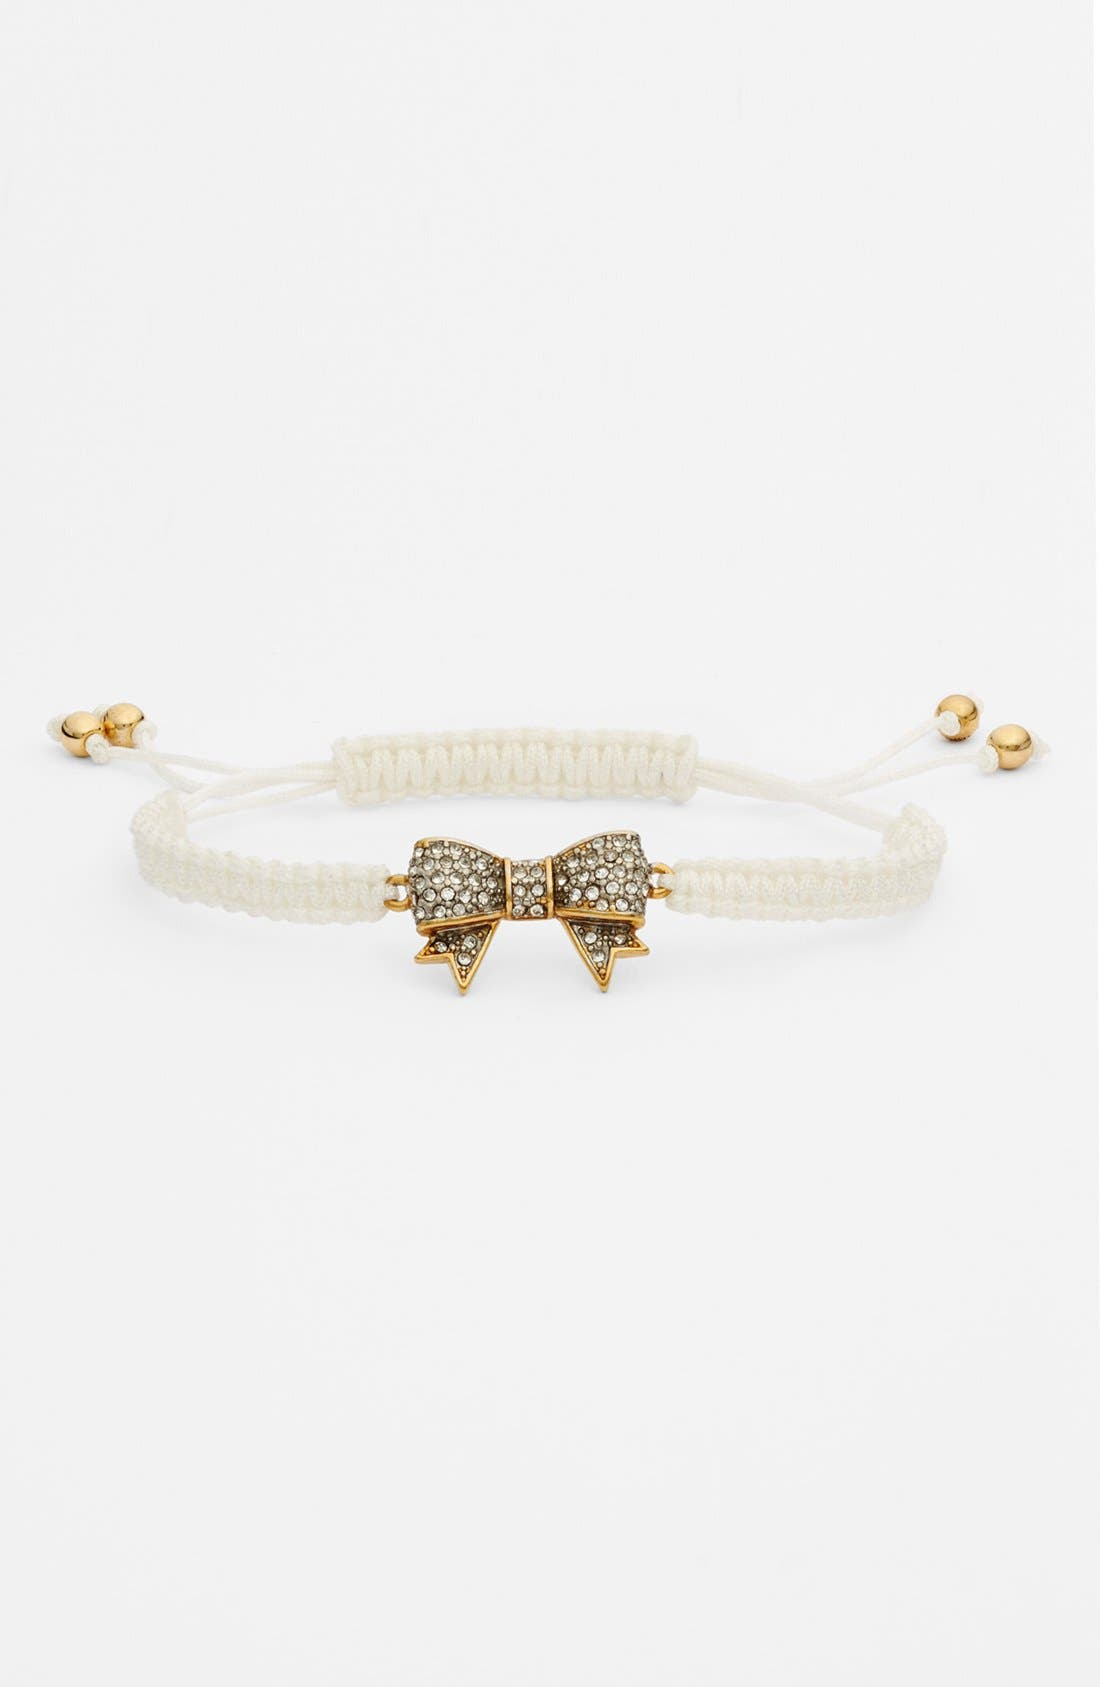 Main Image - Juicy Couture 'Jewelry Box Treasures' Pavé Bow Macramé Bracelet